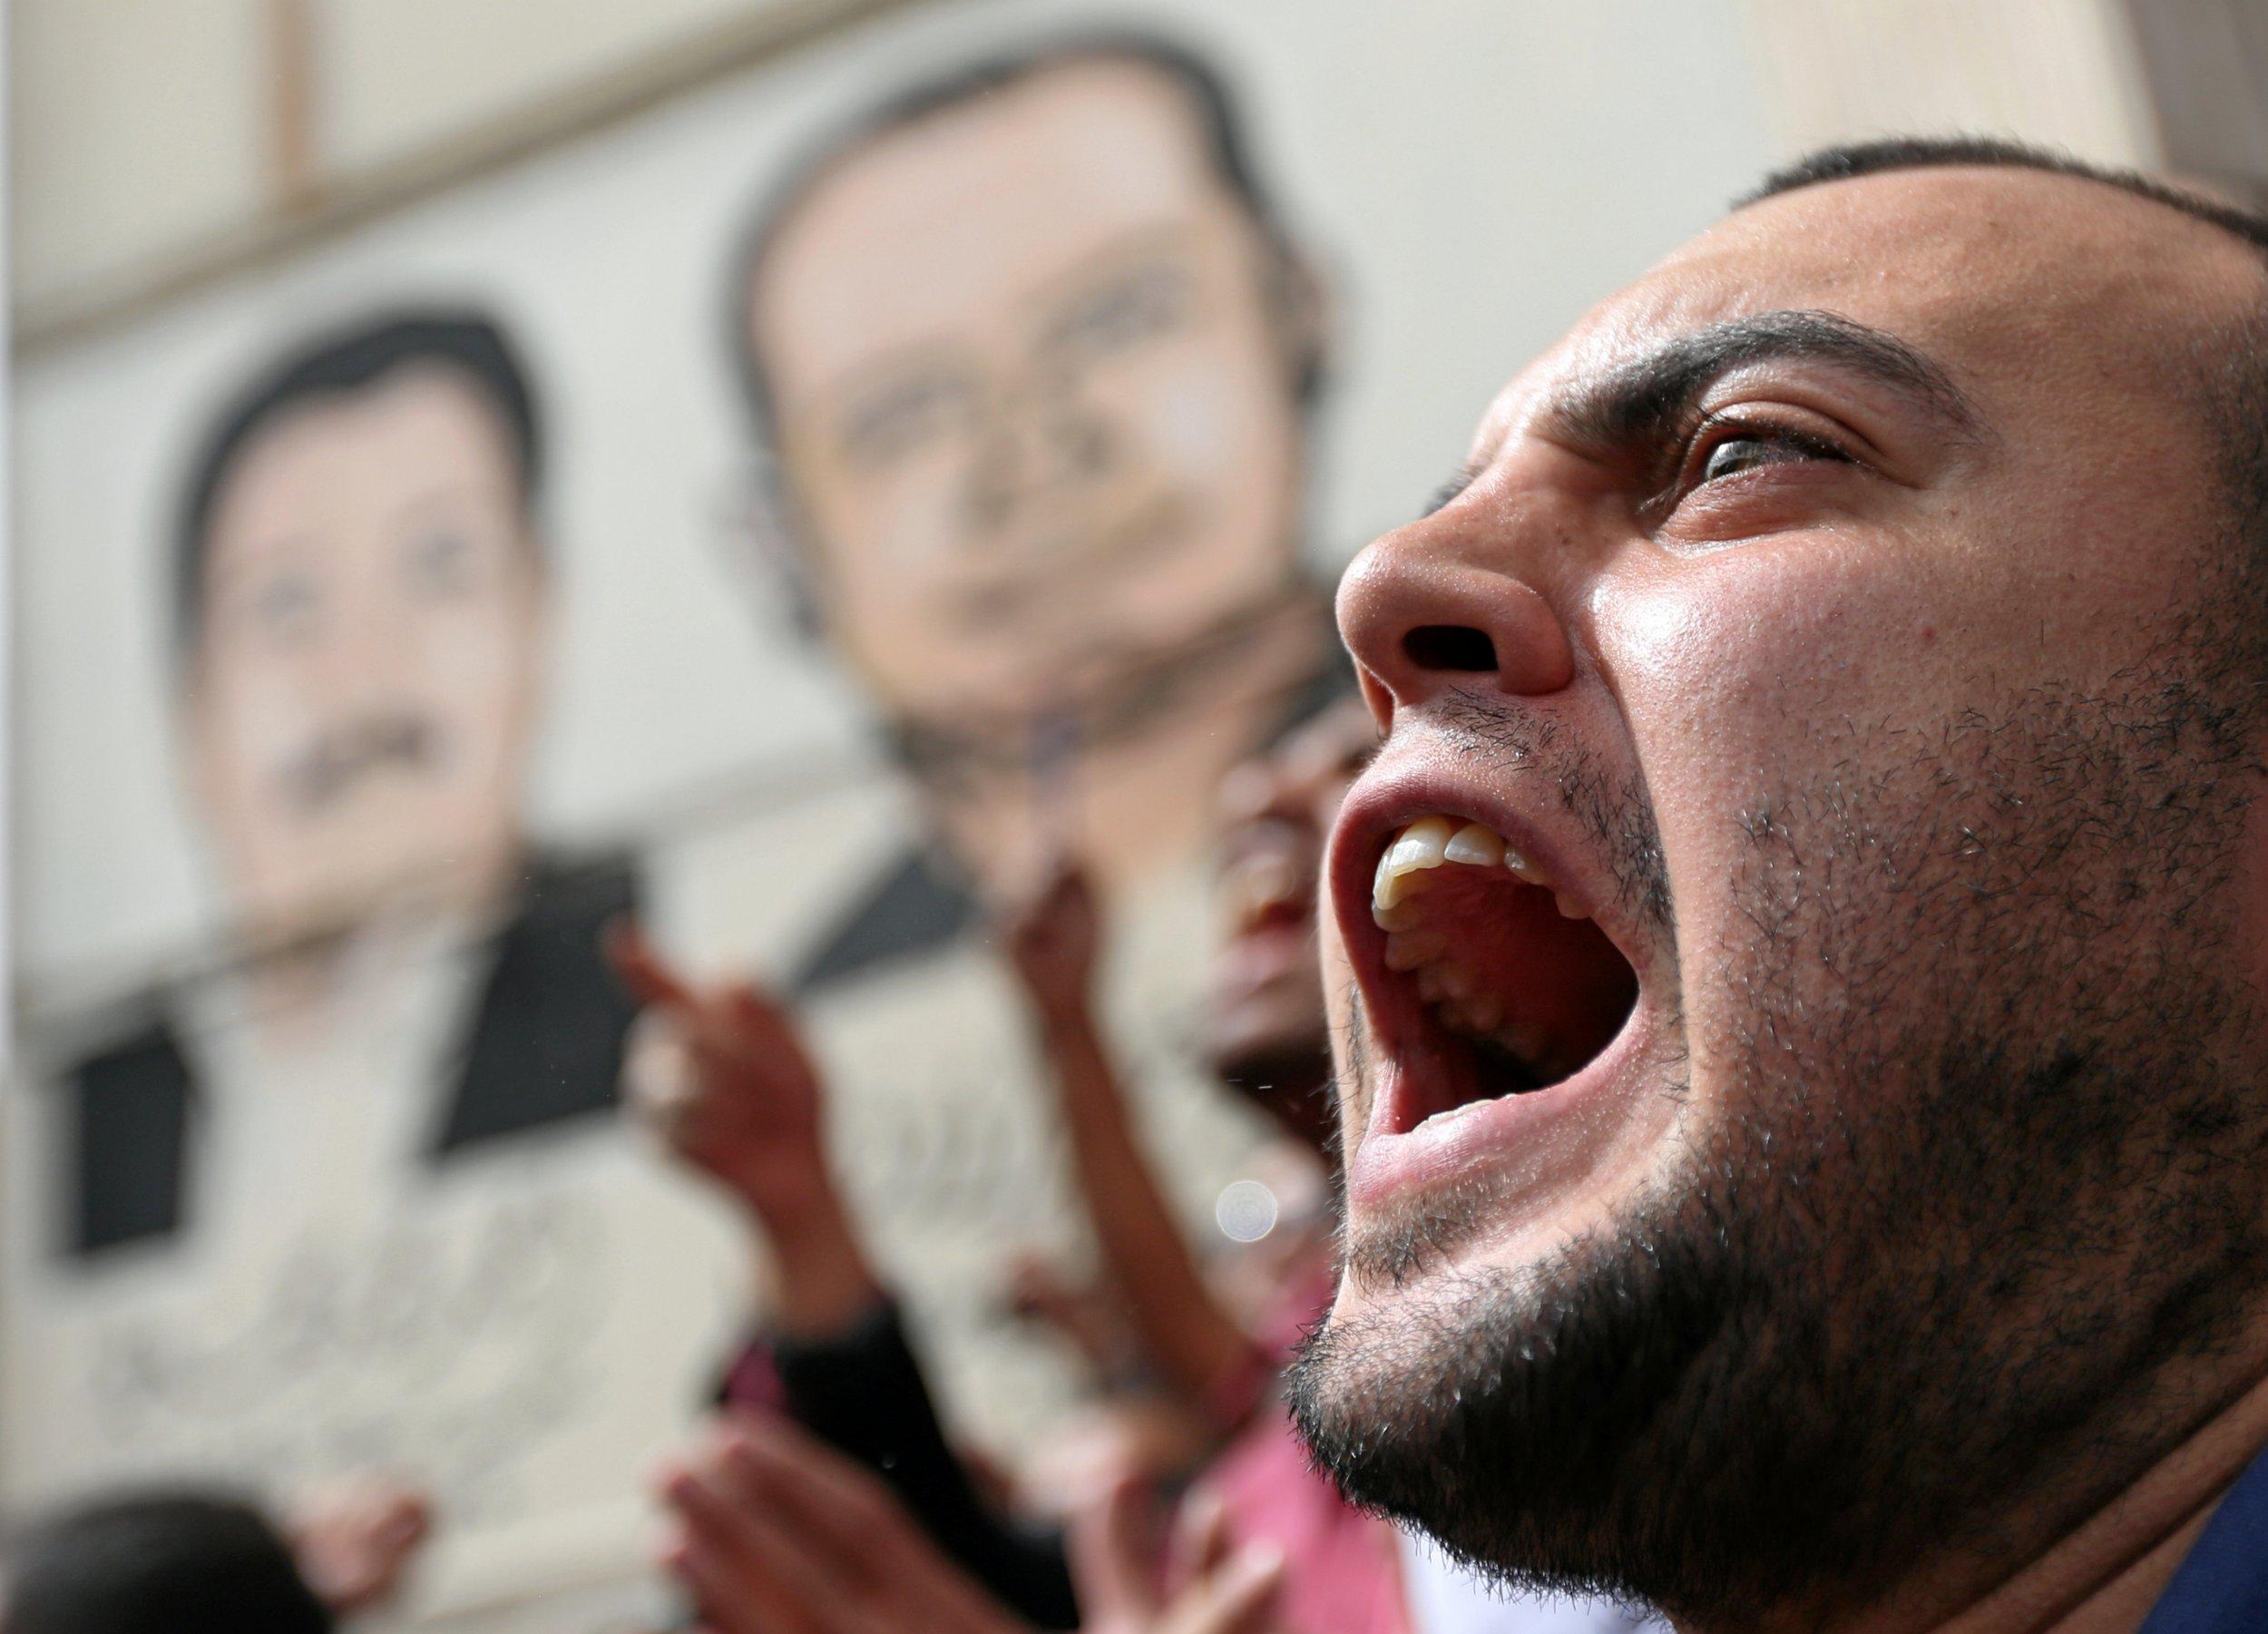 05_13_Egypt_Journos_01